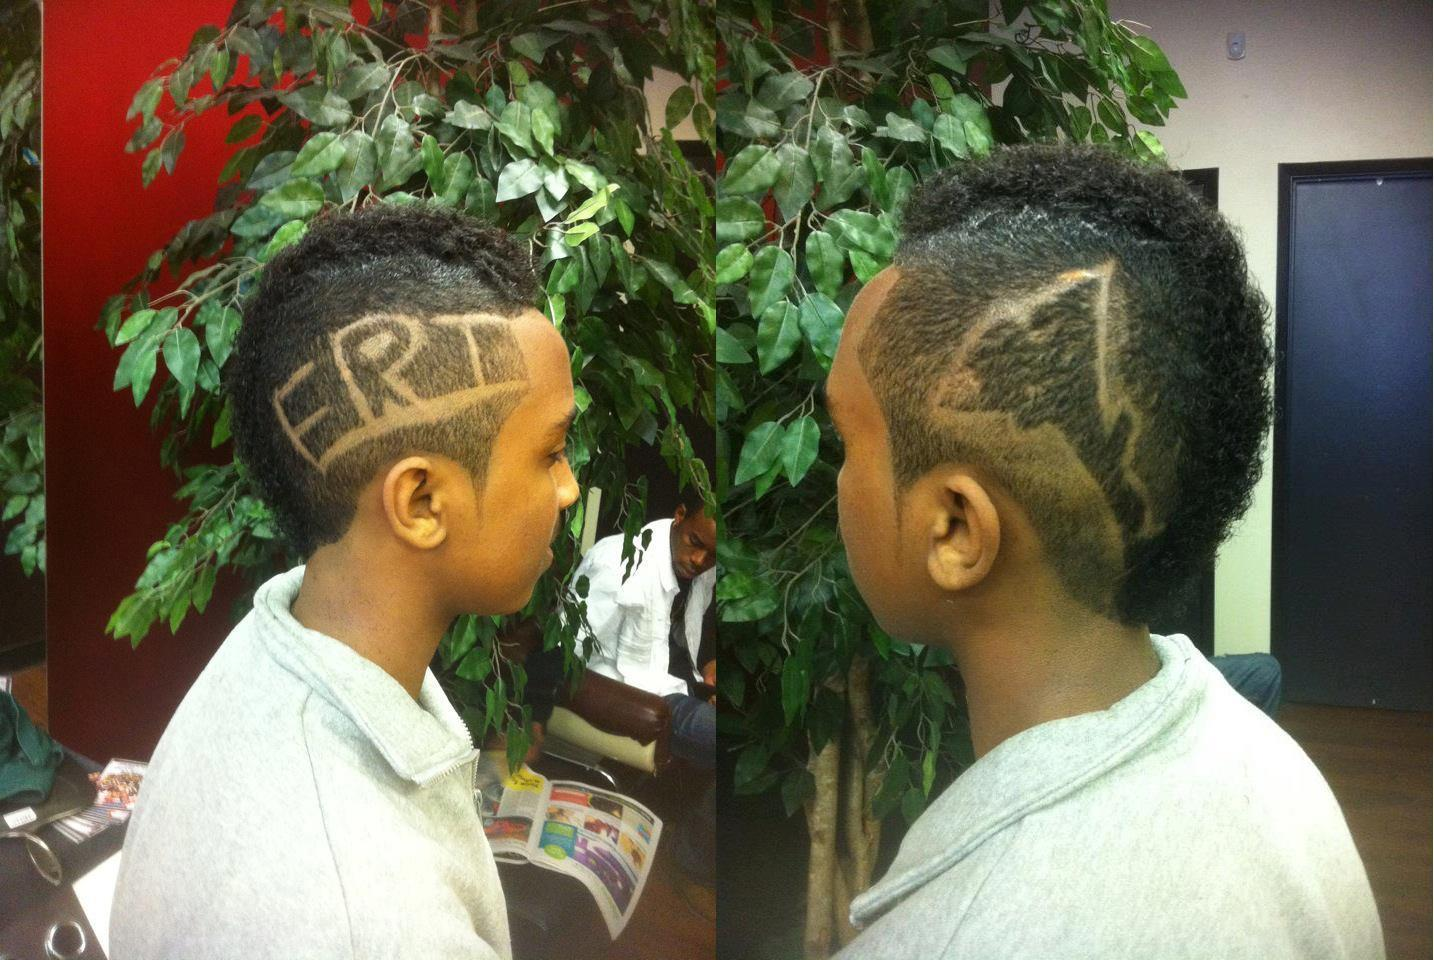 Eritrean: Traditional Eritrean Hairstyles